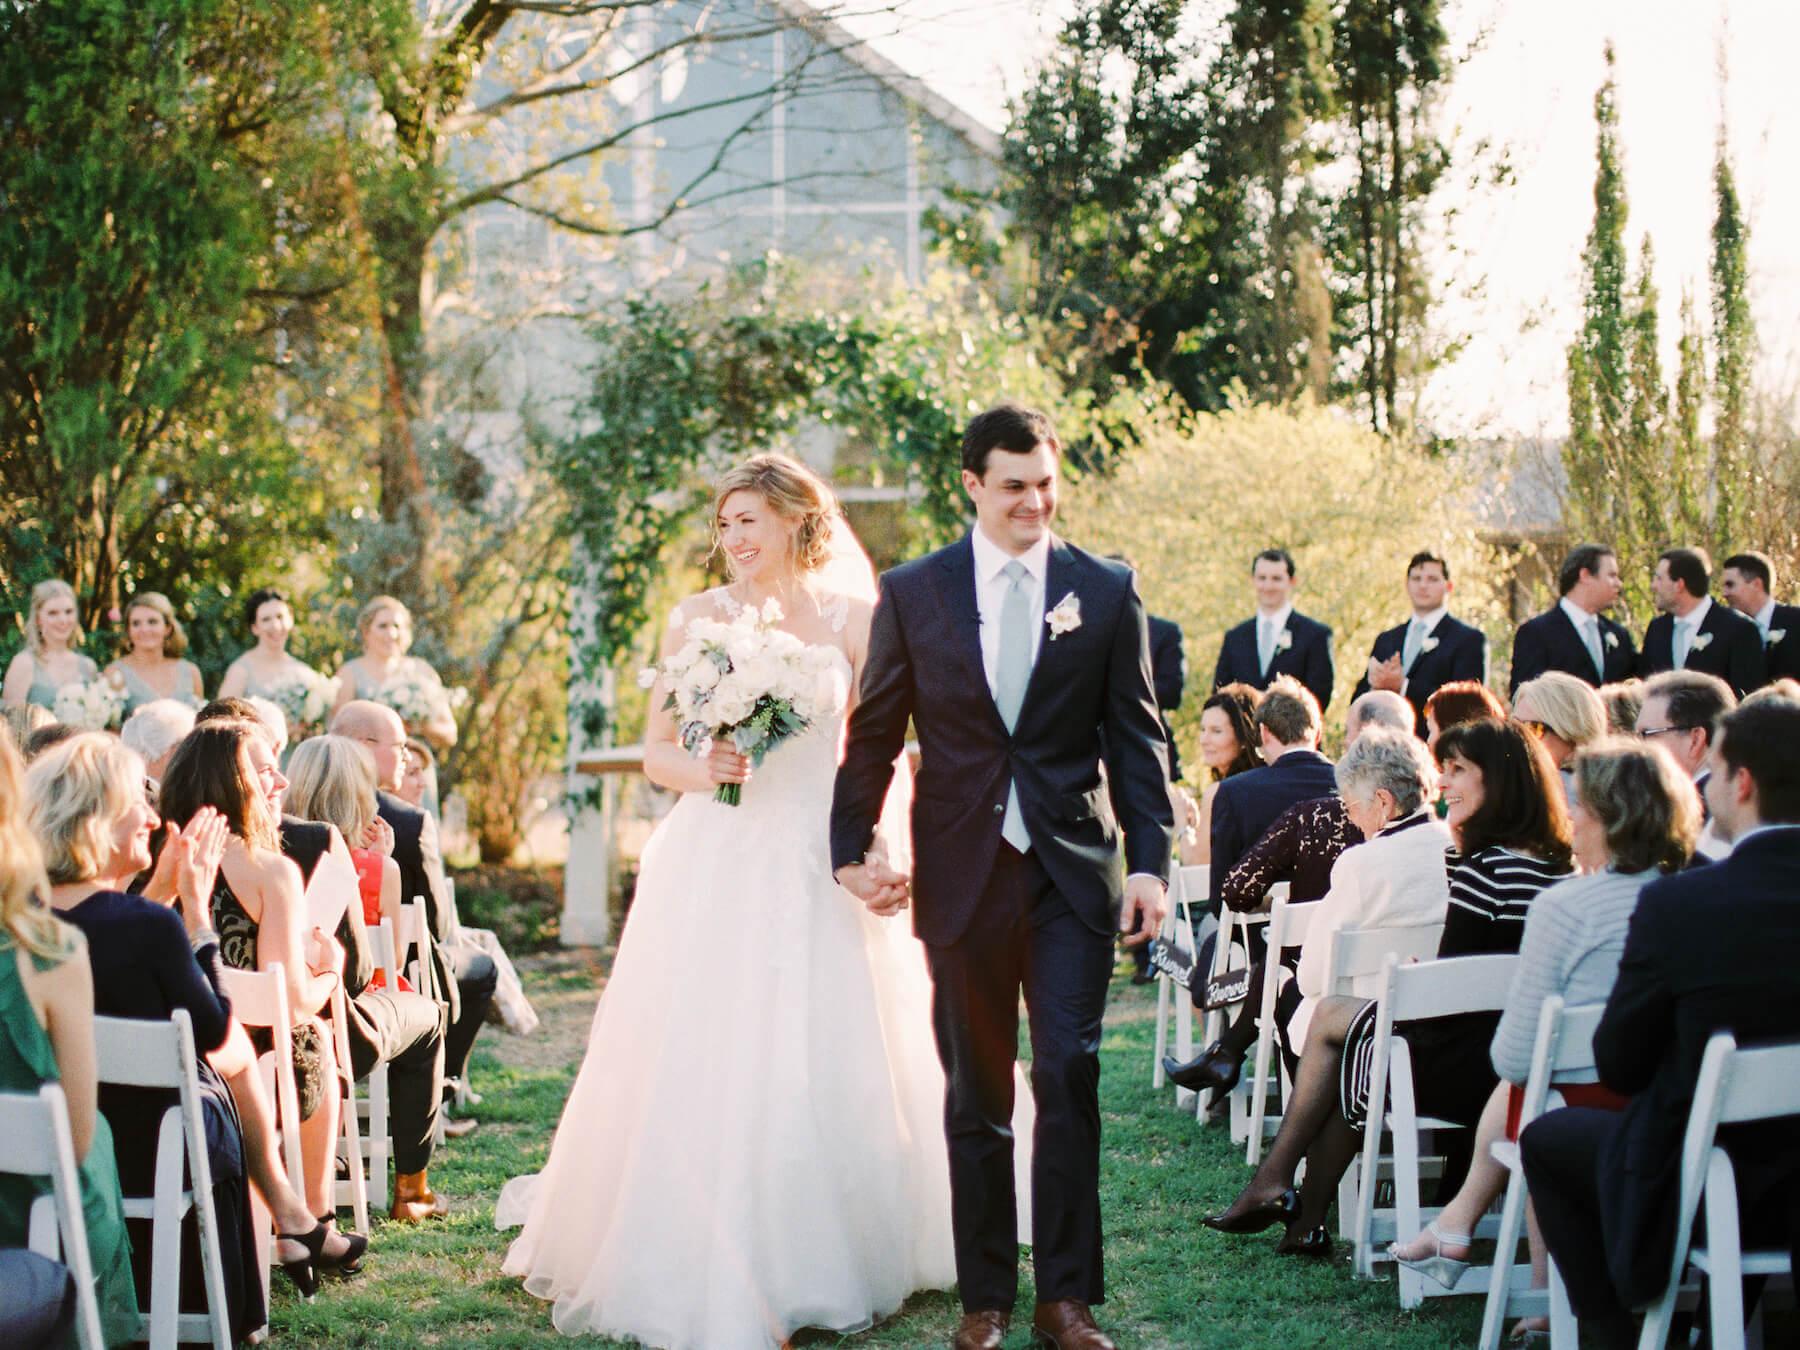 keara-william-wedding-486-2.jpg